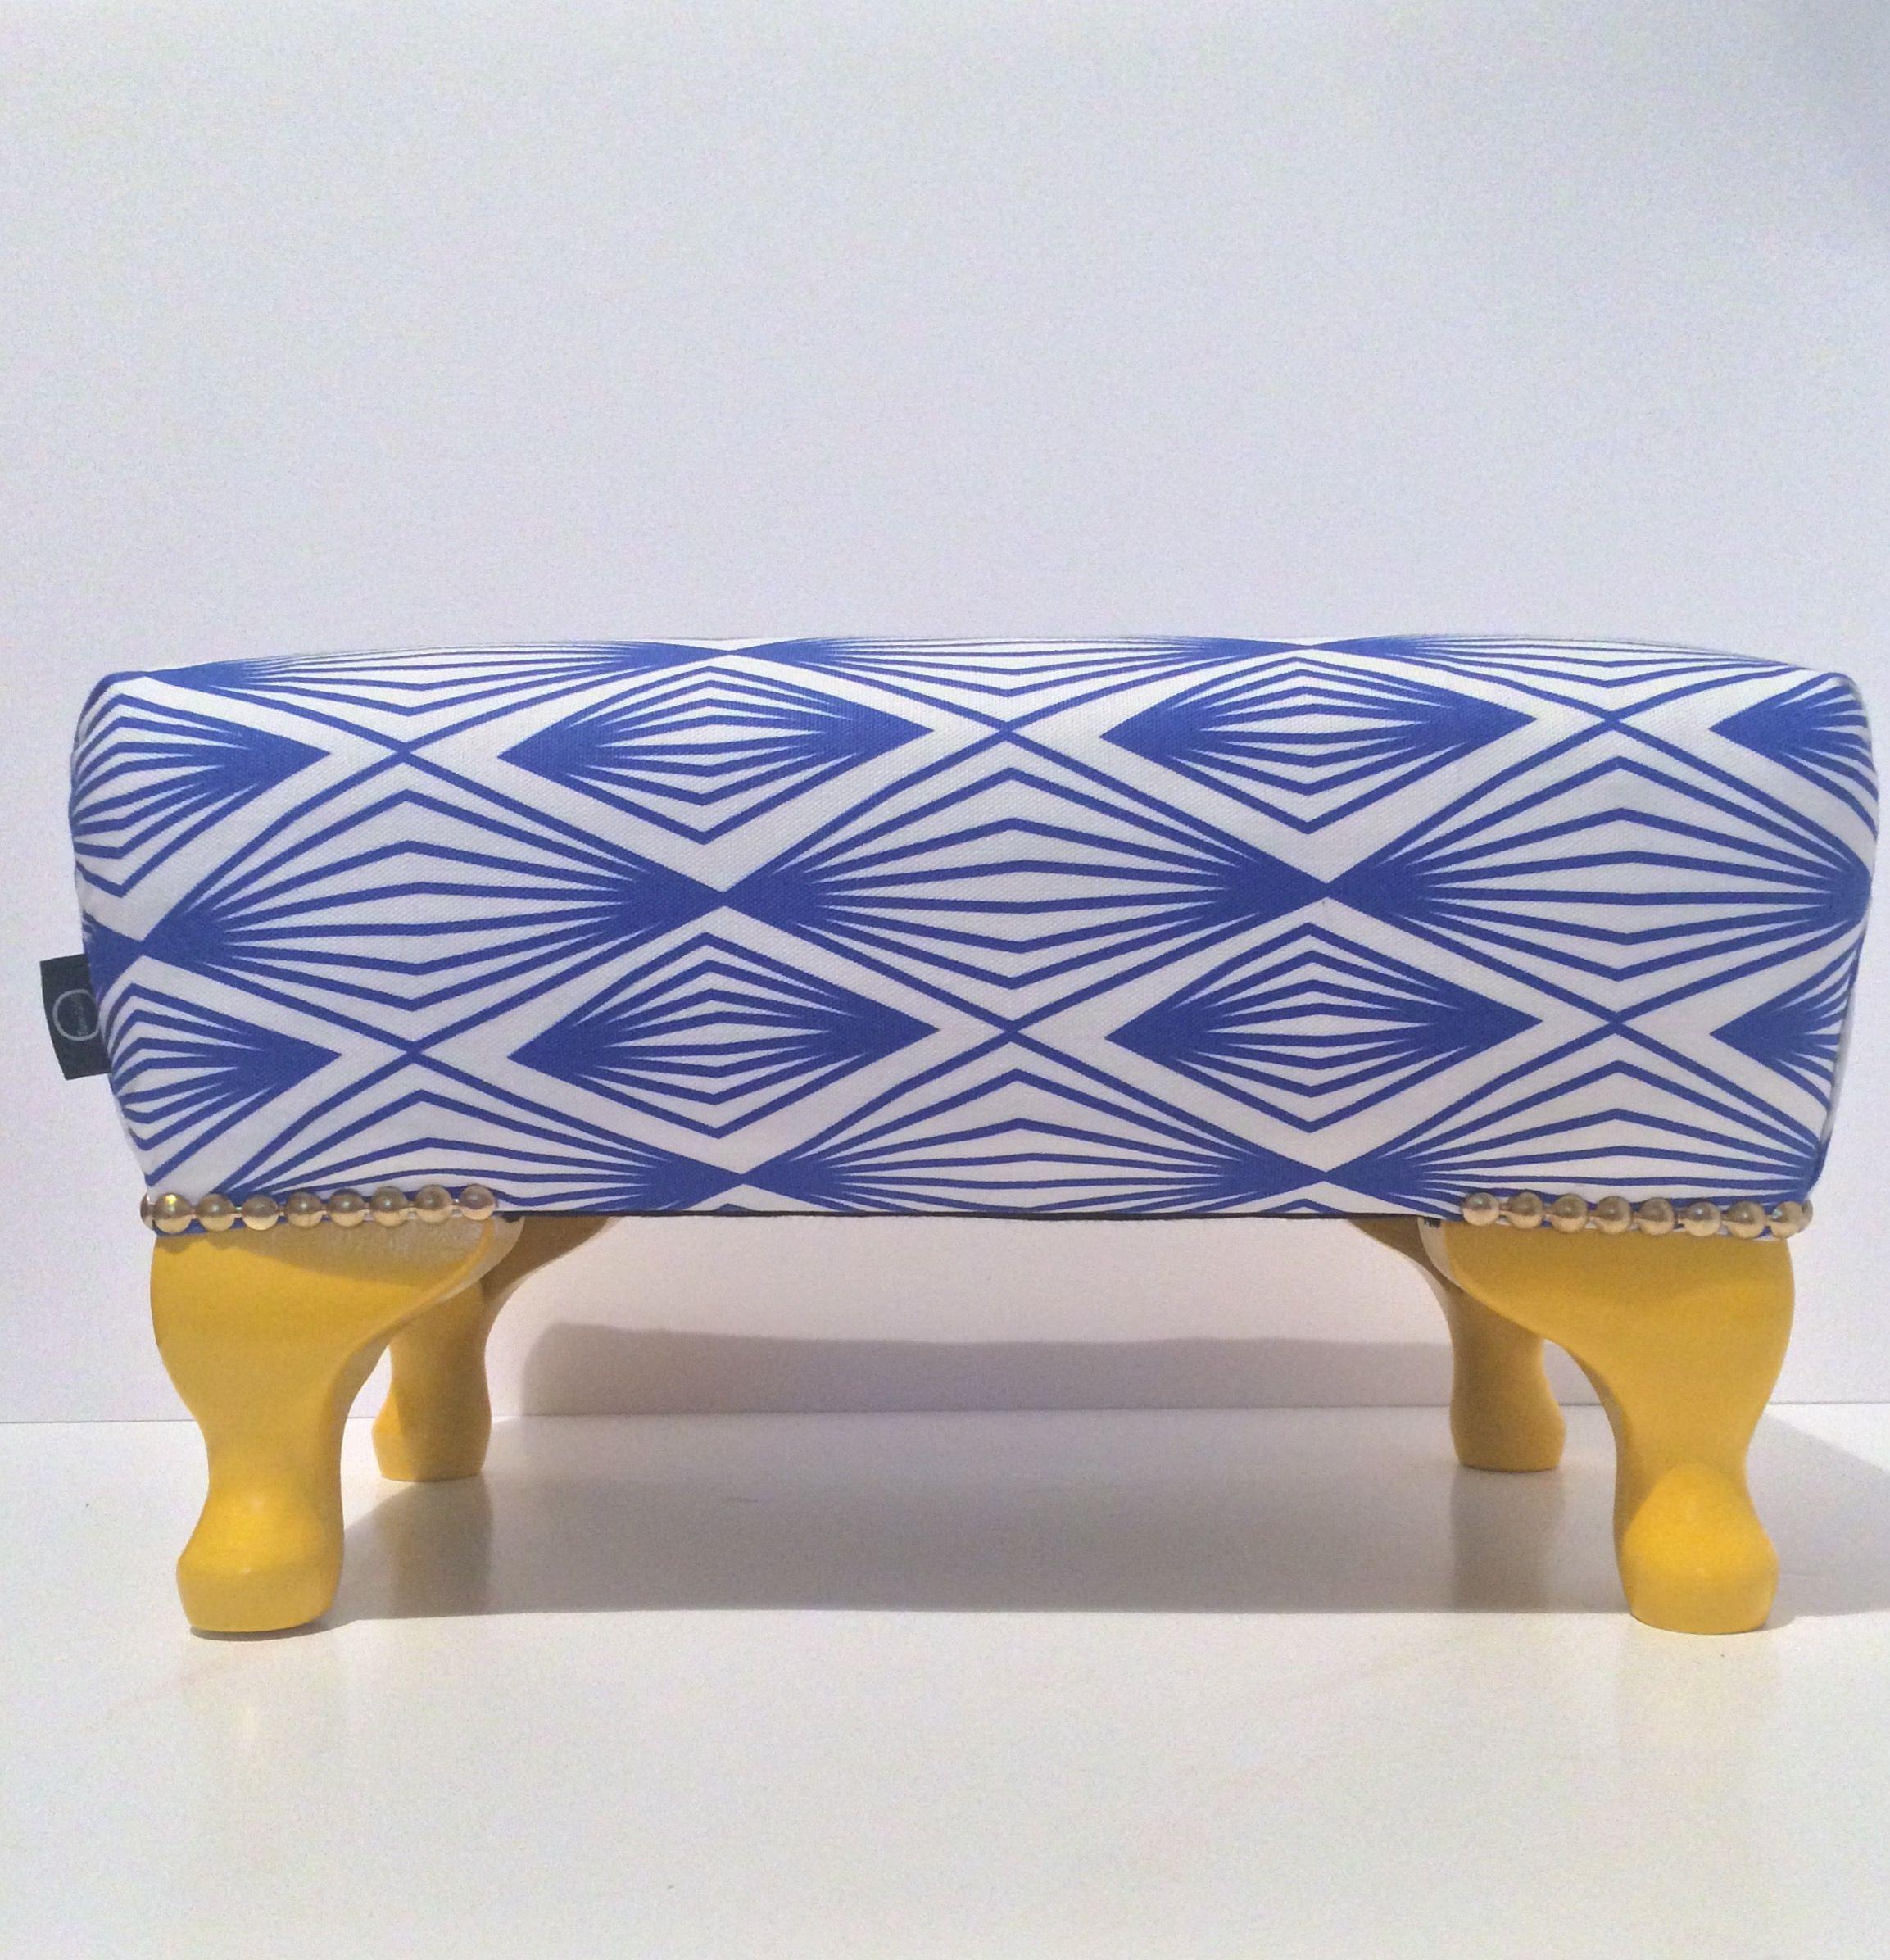 Bespoke blue and yellow footstool Yellow footstool